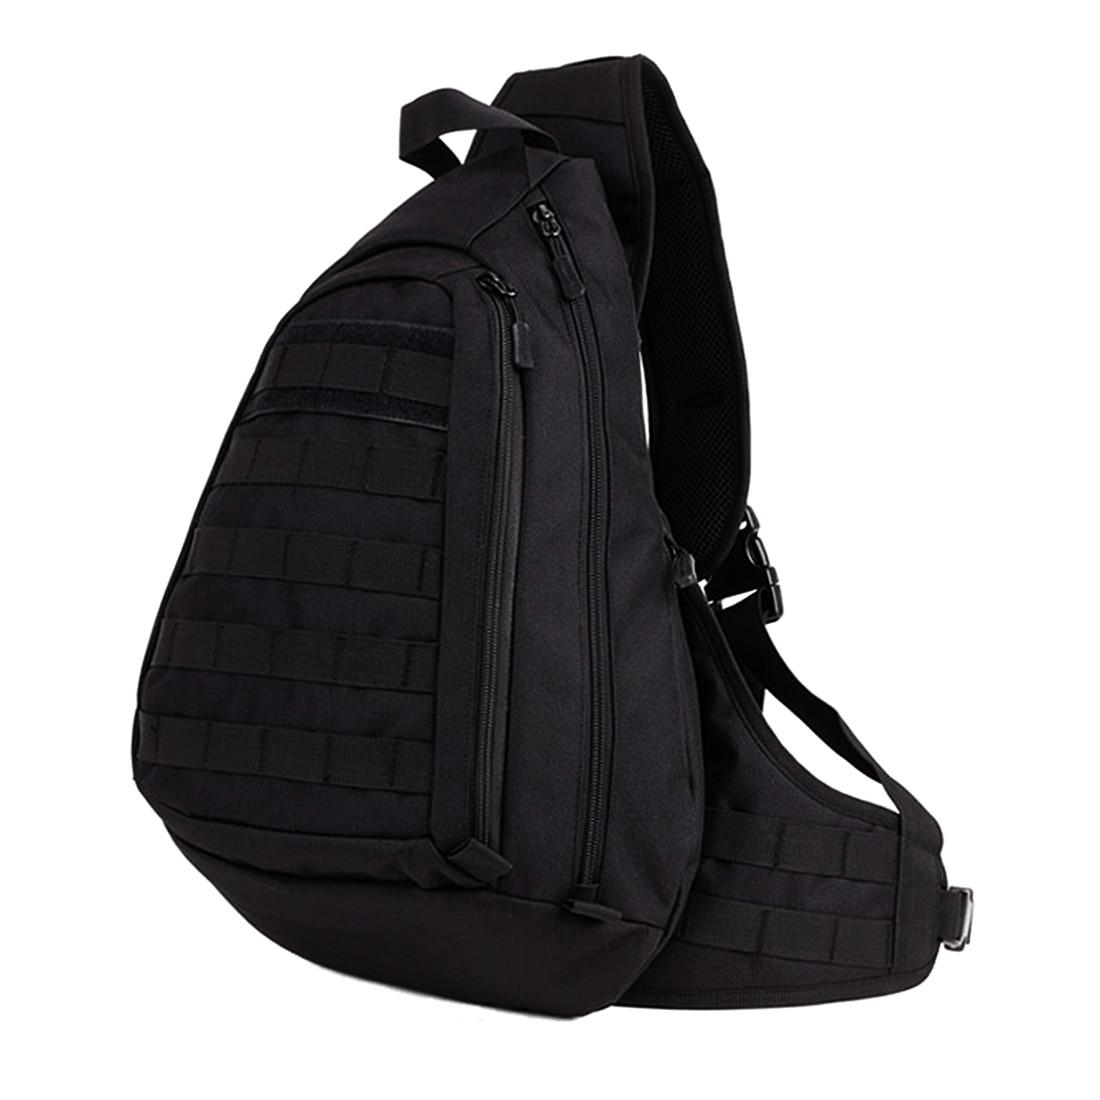 Large Sling Single Shoulder Waterproof Chest Pack Black